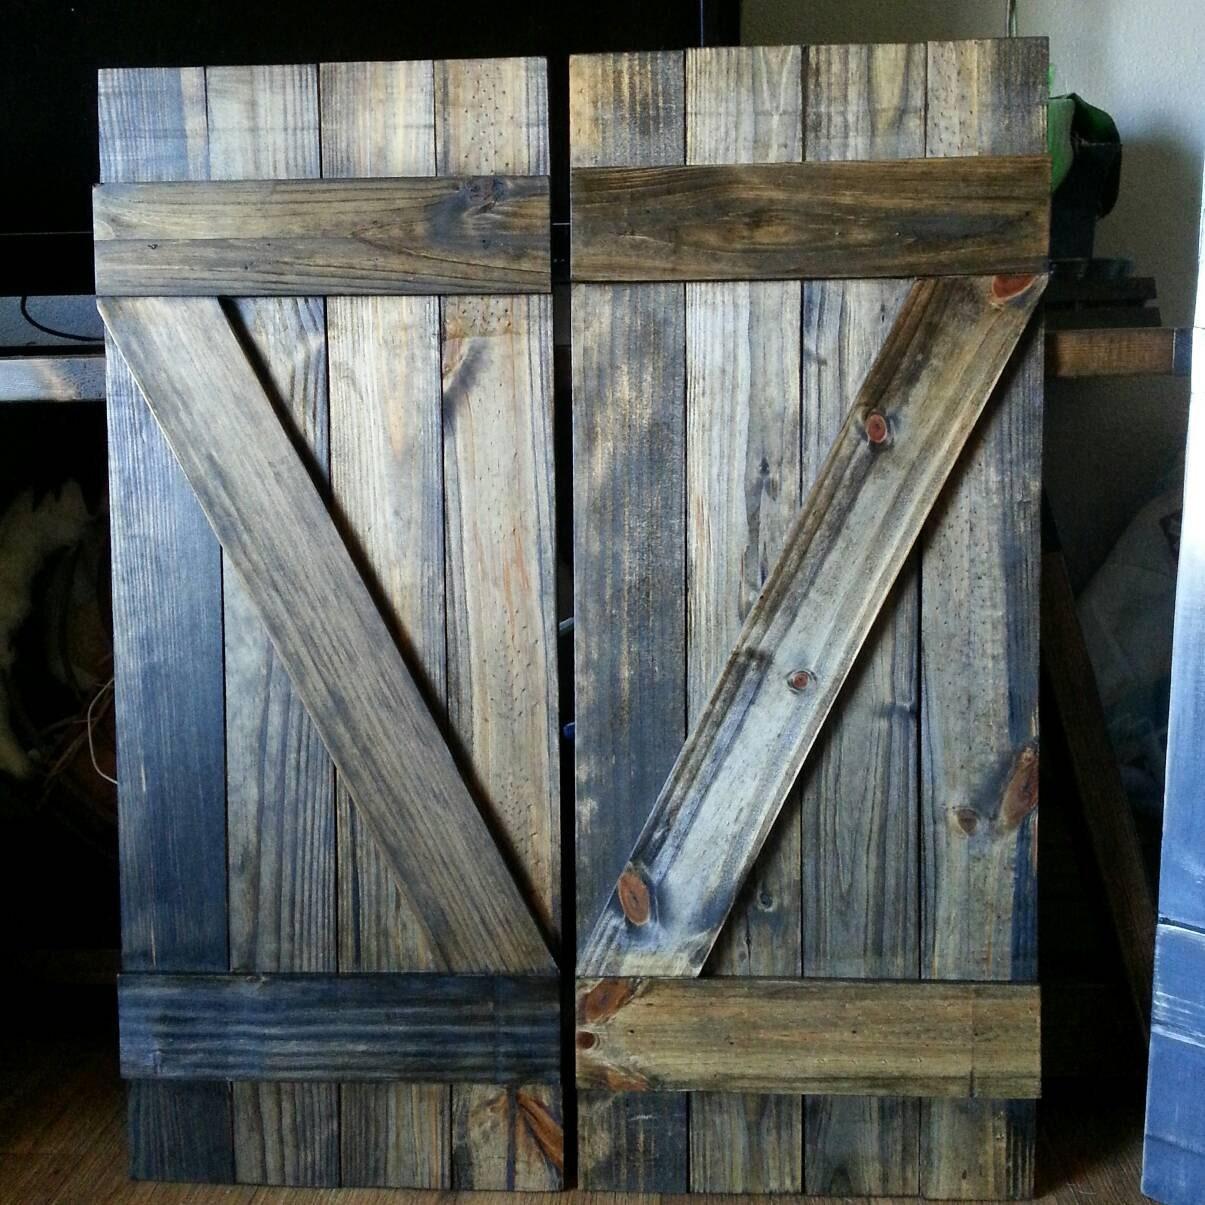 Z Bar Rustic Wood Shutters 24 Decorative Shutters Window Shutters Wall Shutters Exterior